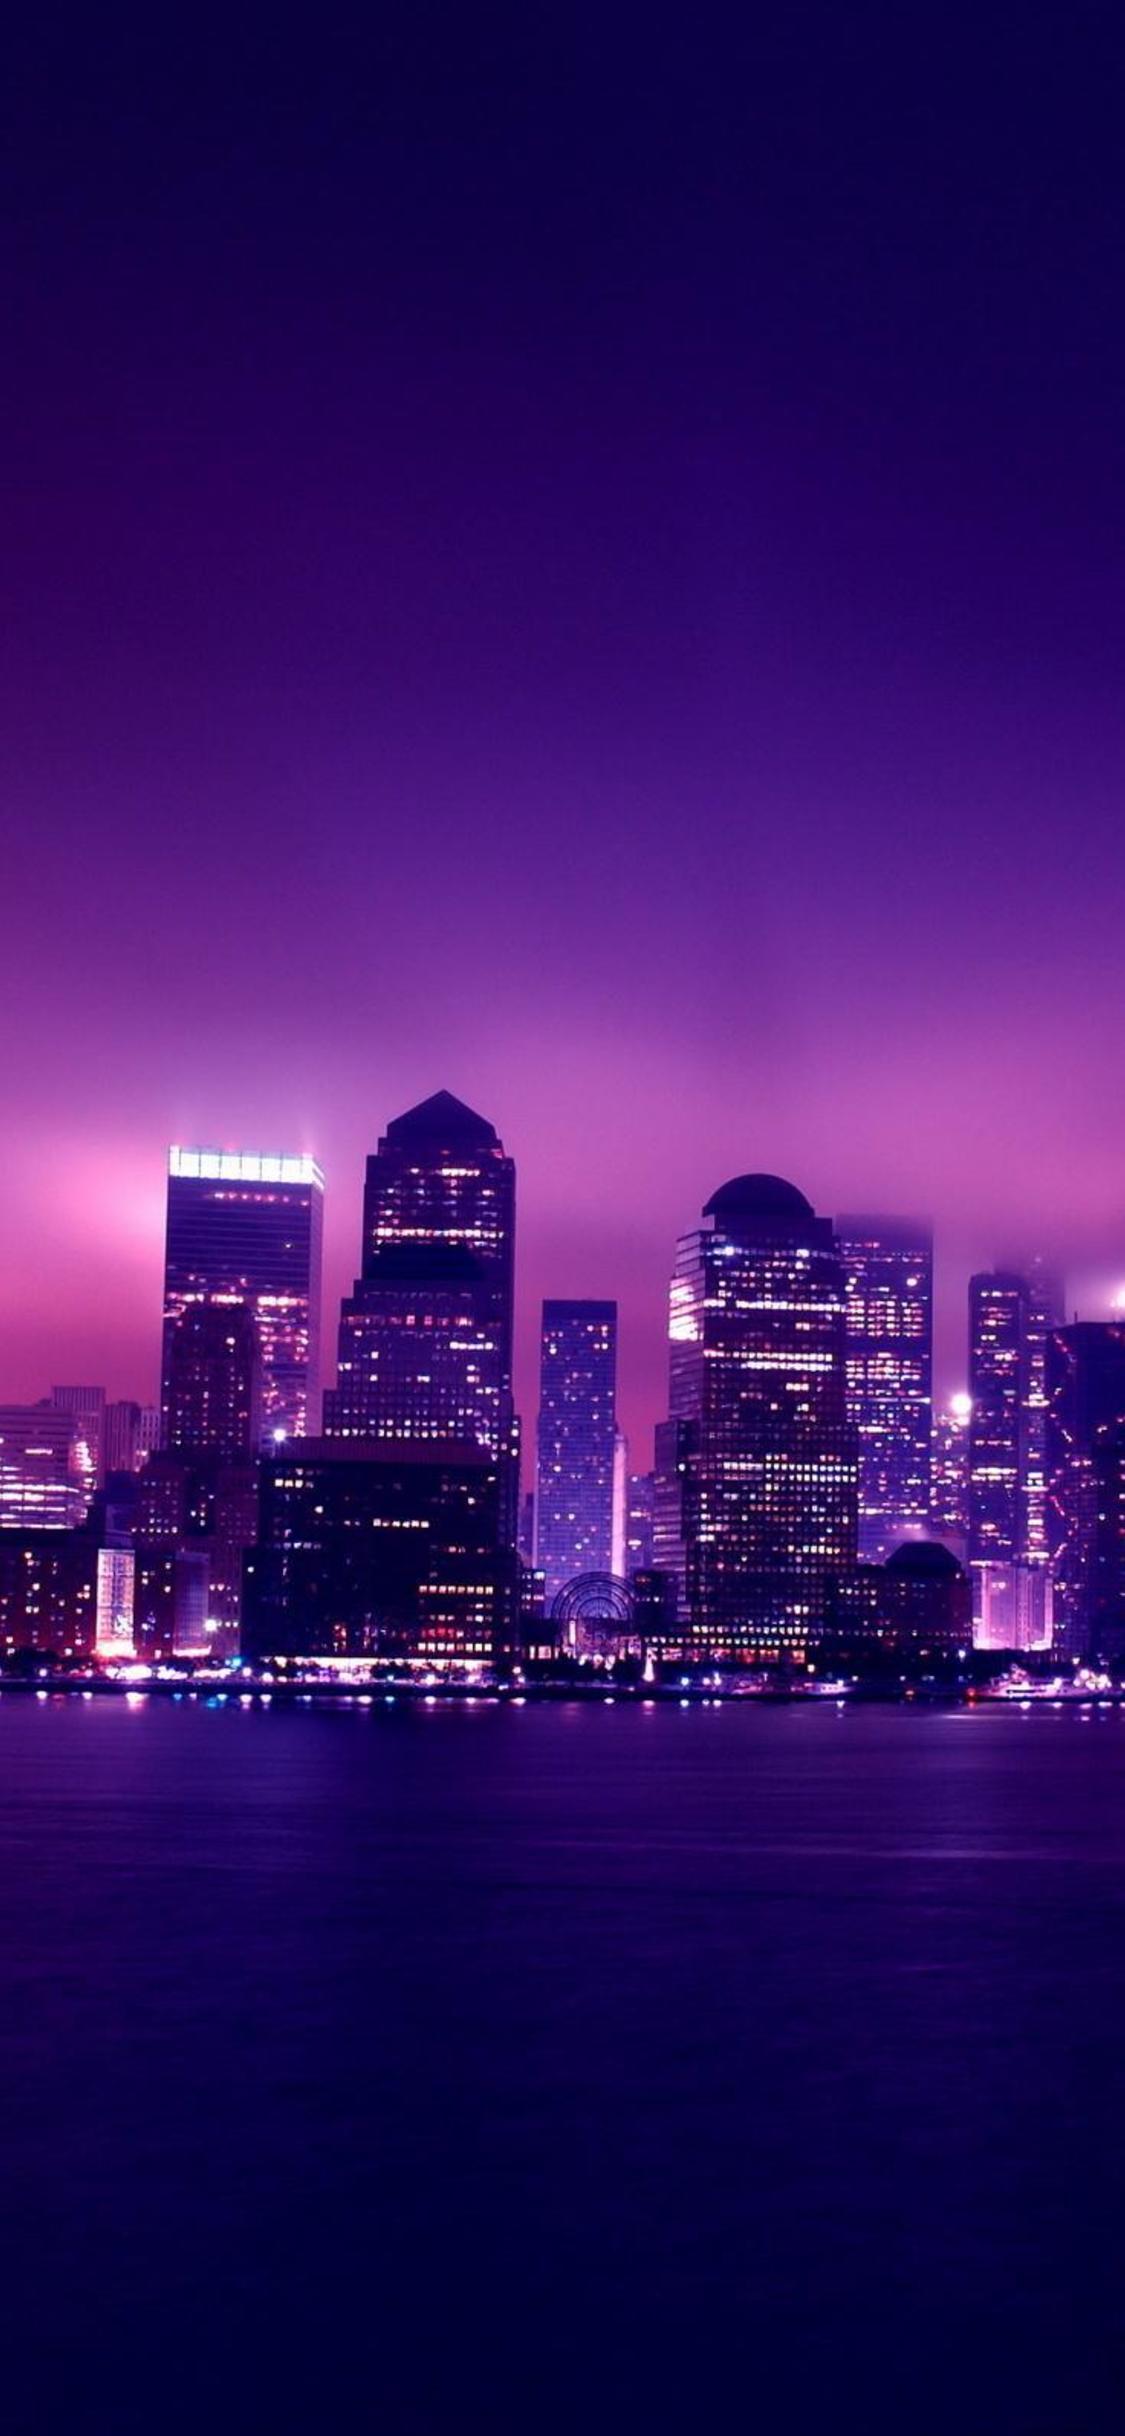 Purple Aesthetic Wallpaper Iphone X 1125x2436